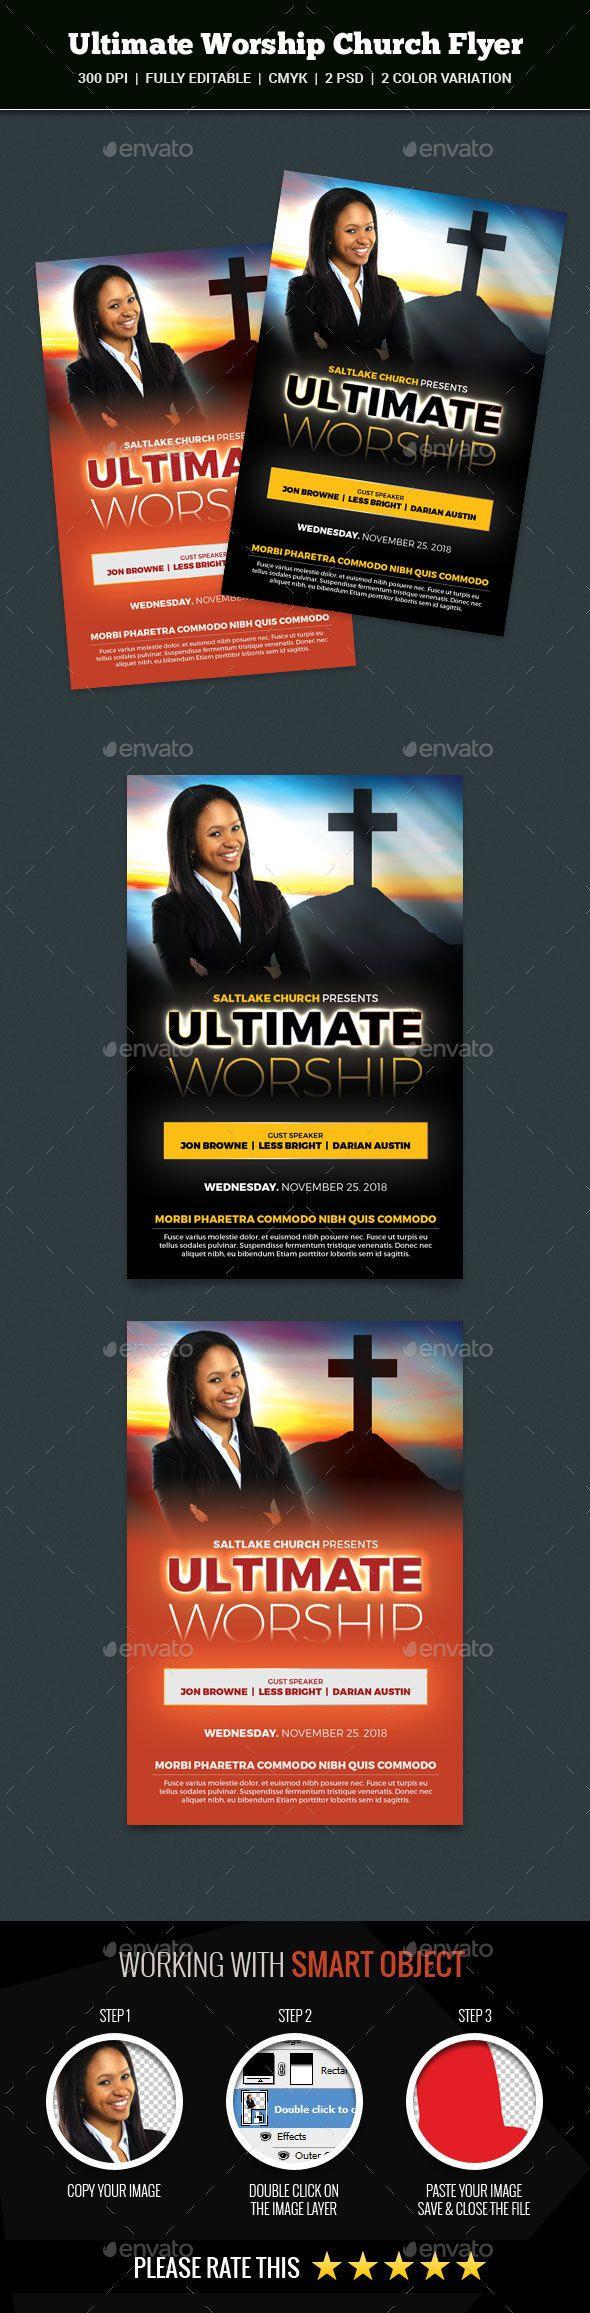 Mejores 1683 imágenes de Church Flyer Design Template en Pinterest ...